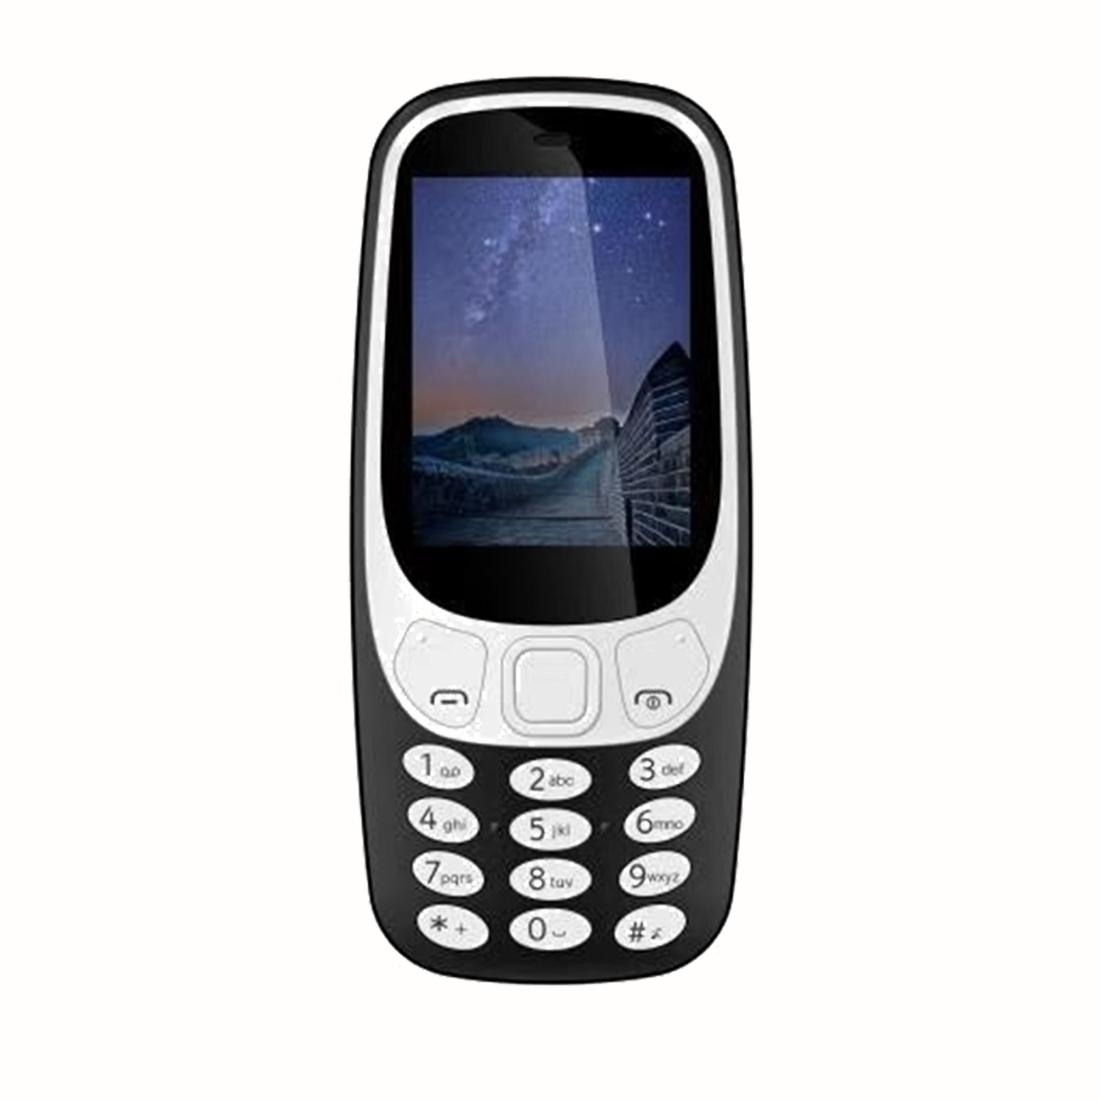 I Kall K71 Single SIM 1.8 inch Without Camera